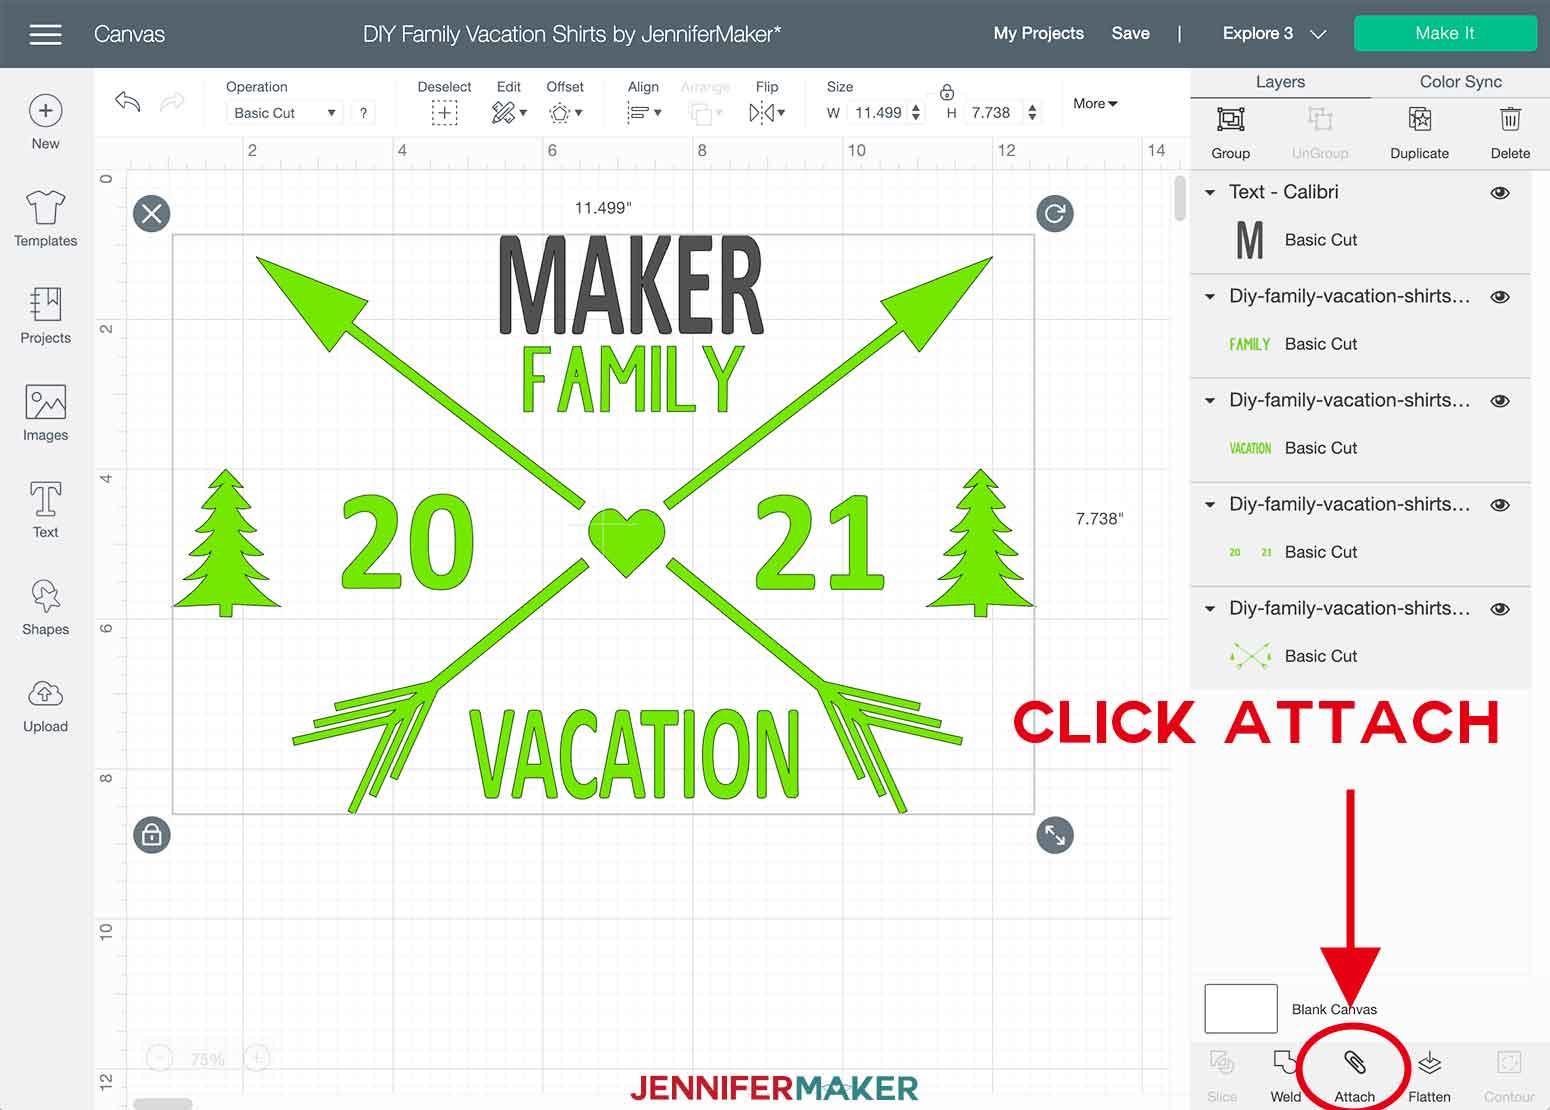 DIY Family Vacation Shirts Cricut Design Space Attach